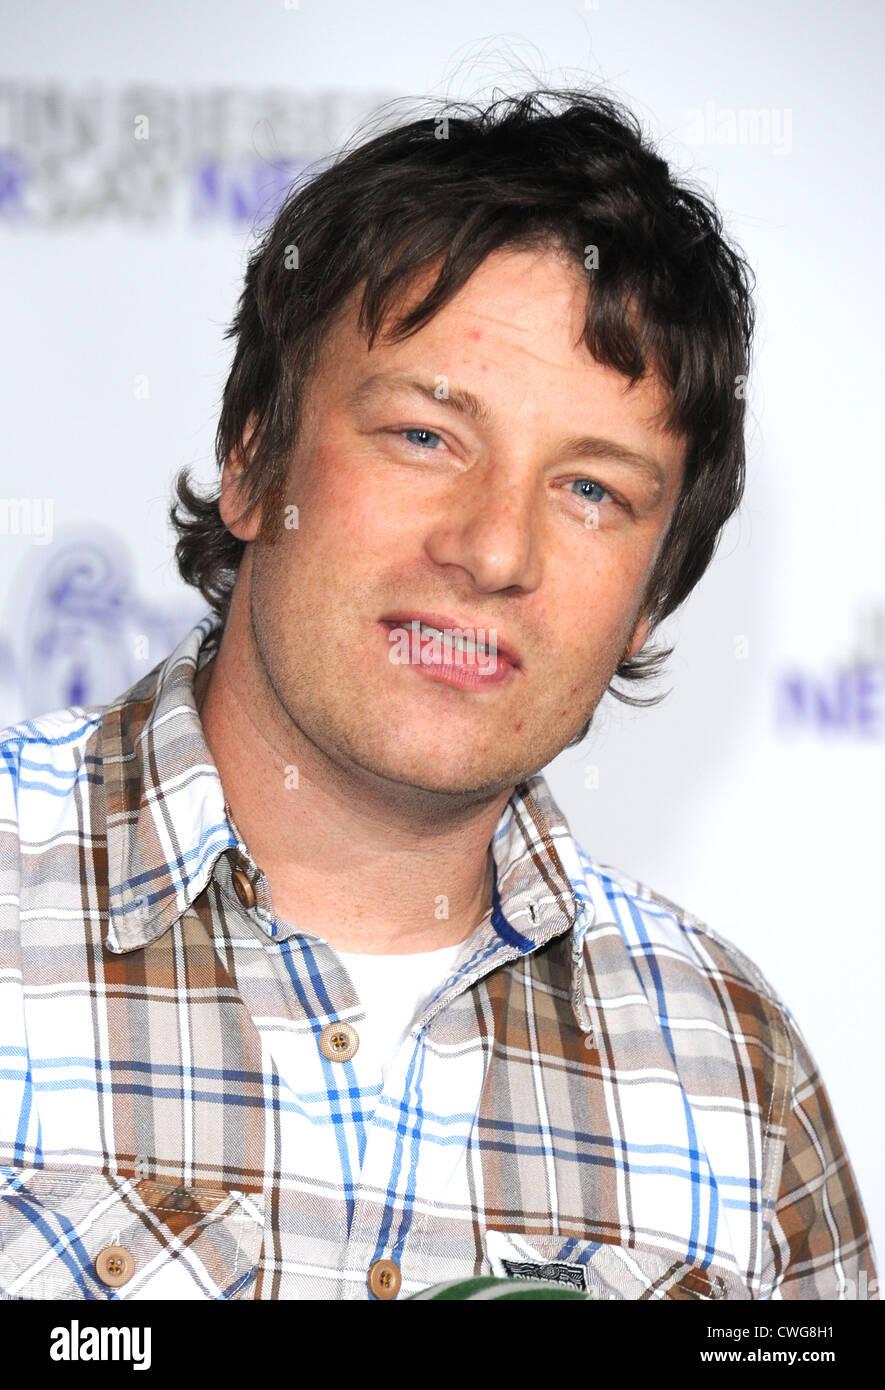 Jamie Oliver - Stock Image